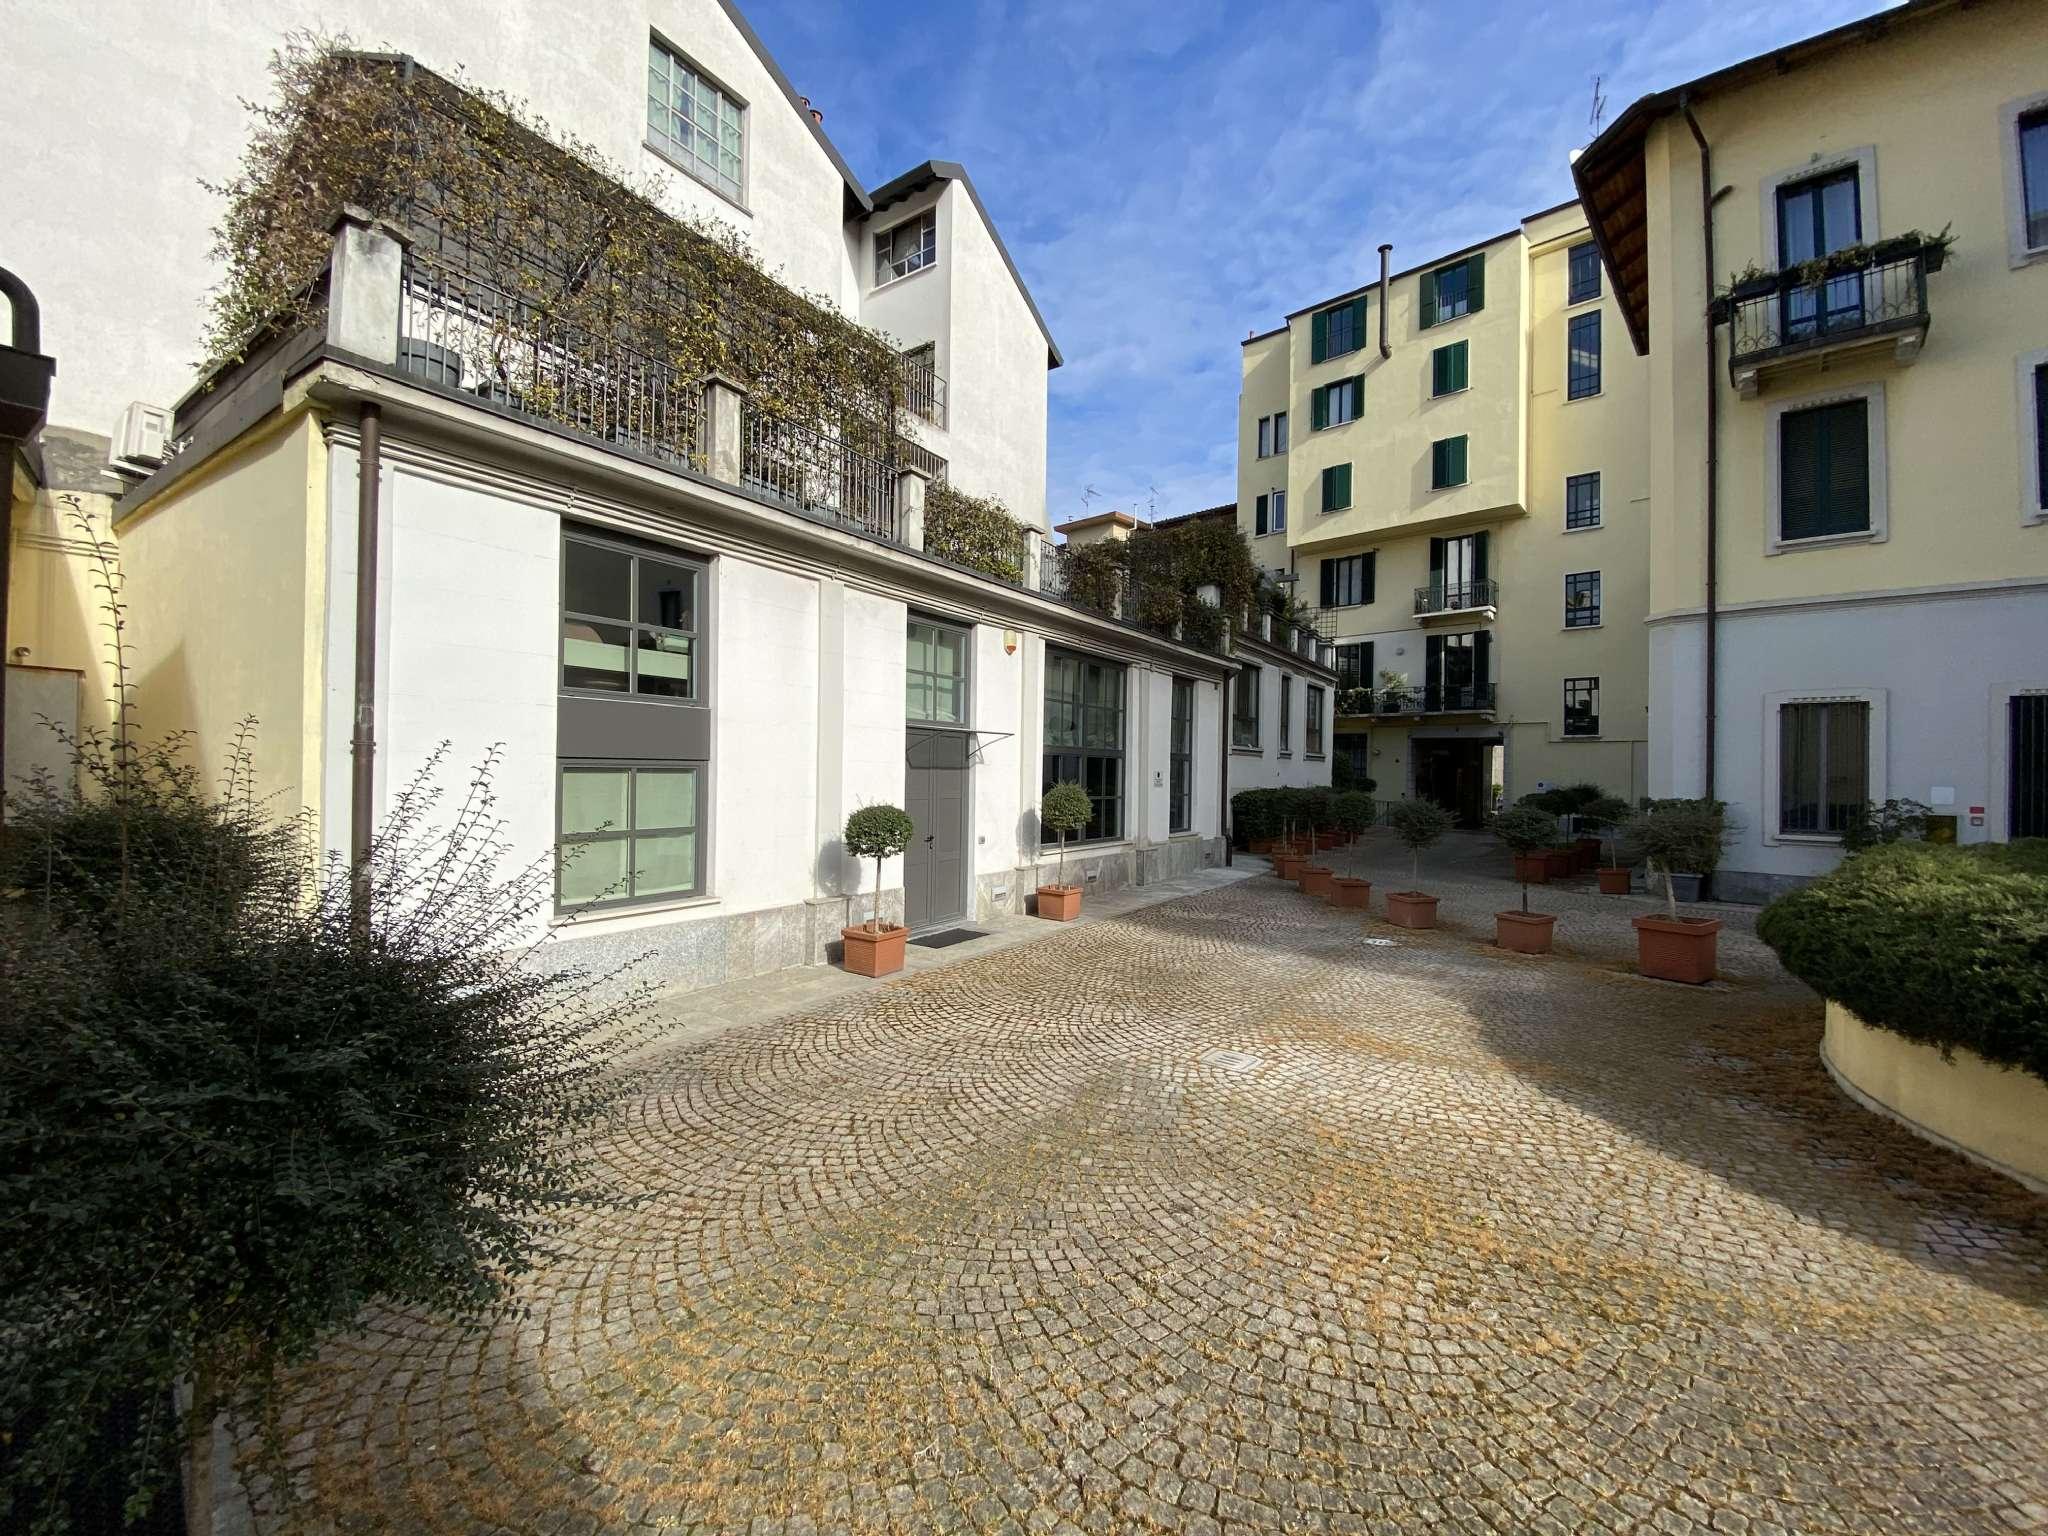 Casa indipendente in Vendita a Milano 17 Marghera / Wagner / Fiera: 5 locali, 185 mq